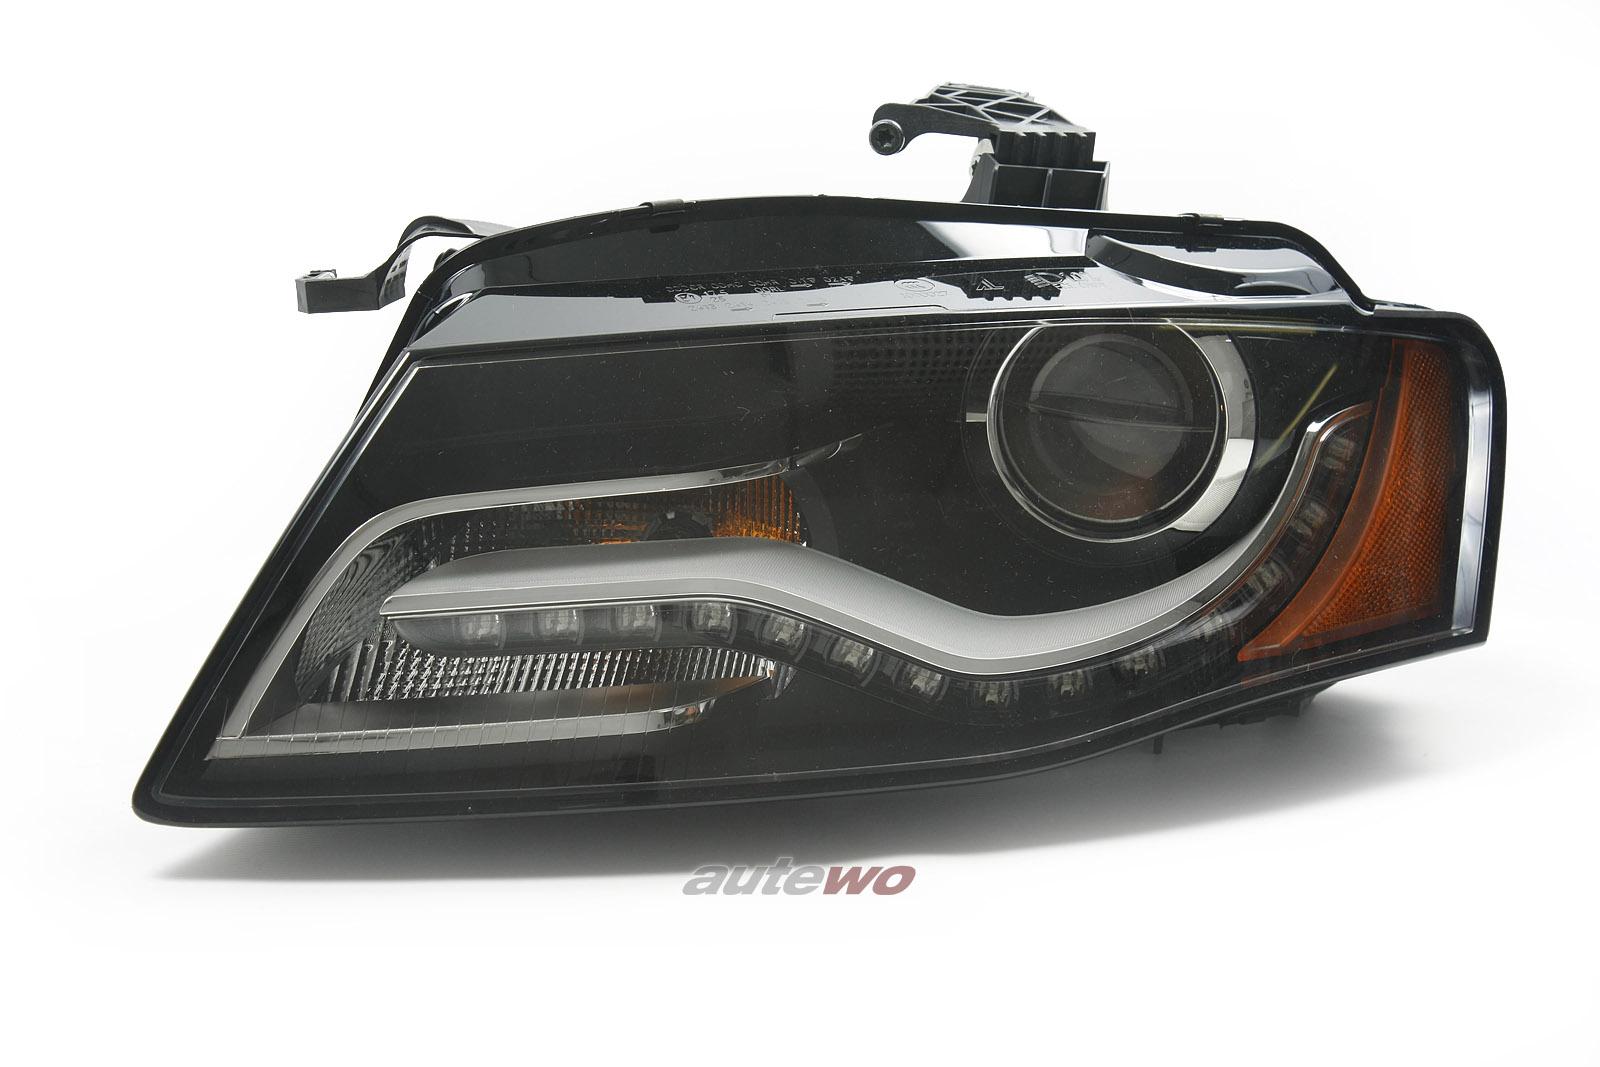 8K0941029AP/J NEU Audi A4/Allroad 8K Bixenon-Scheinwerfer LED US Links